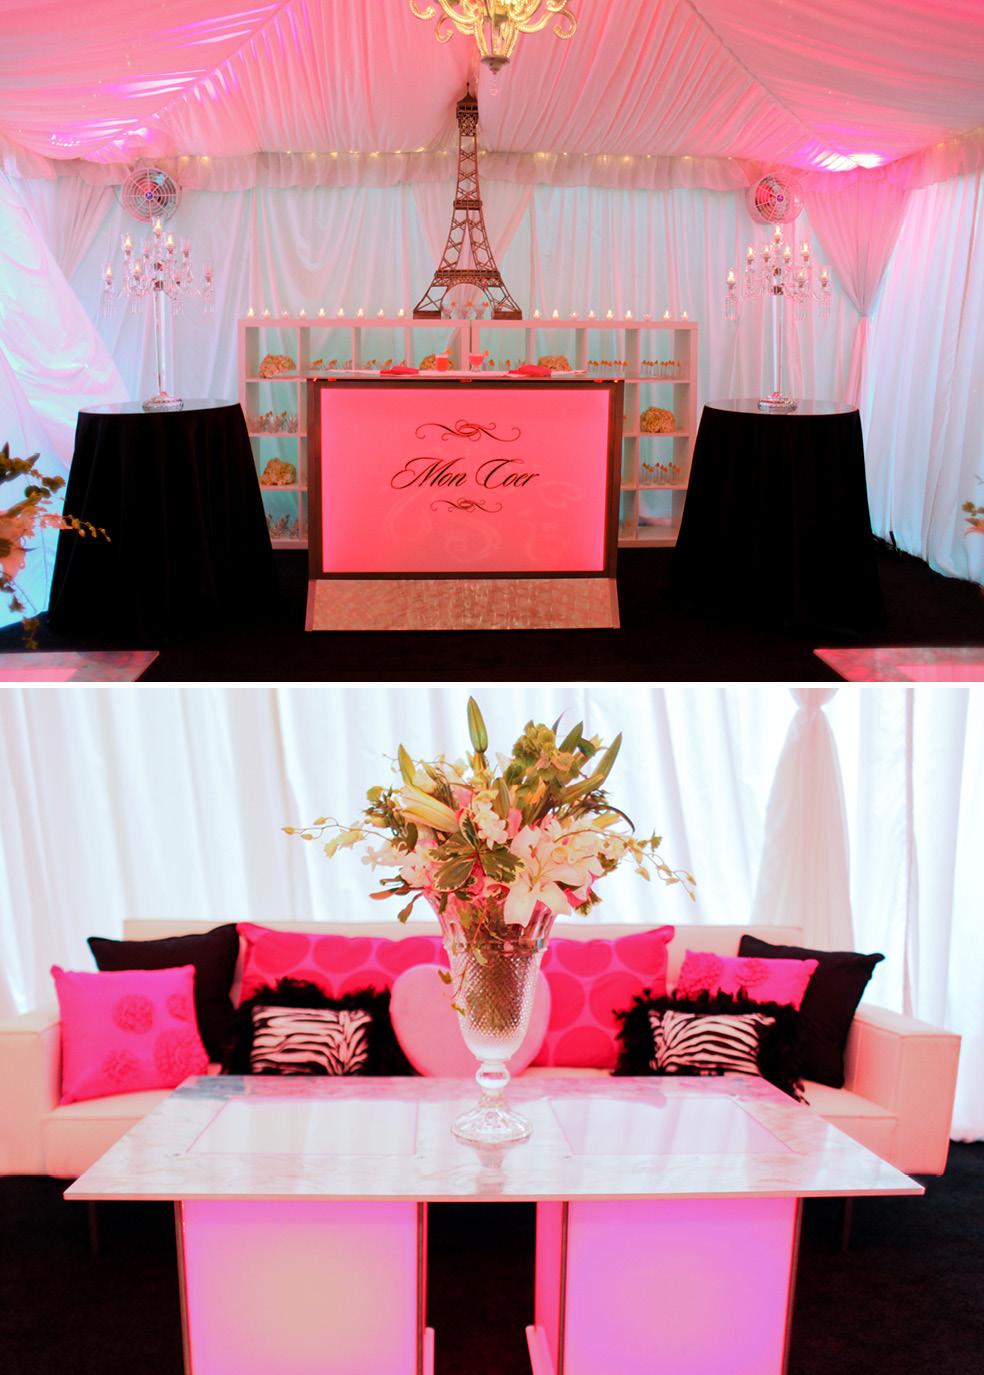 primrose-cottage-wedding-reception-pink-black-decor - The ...